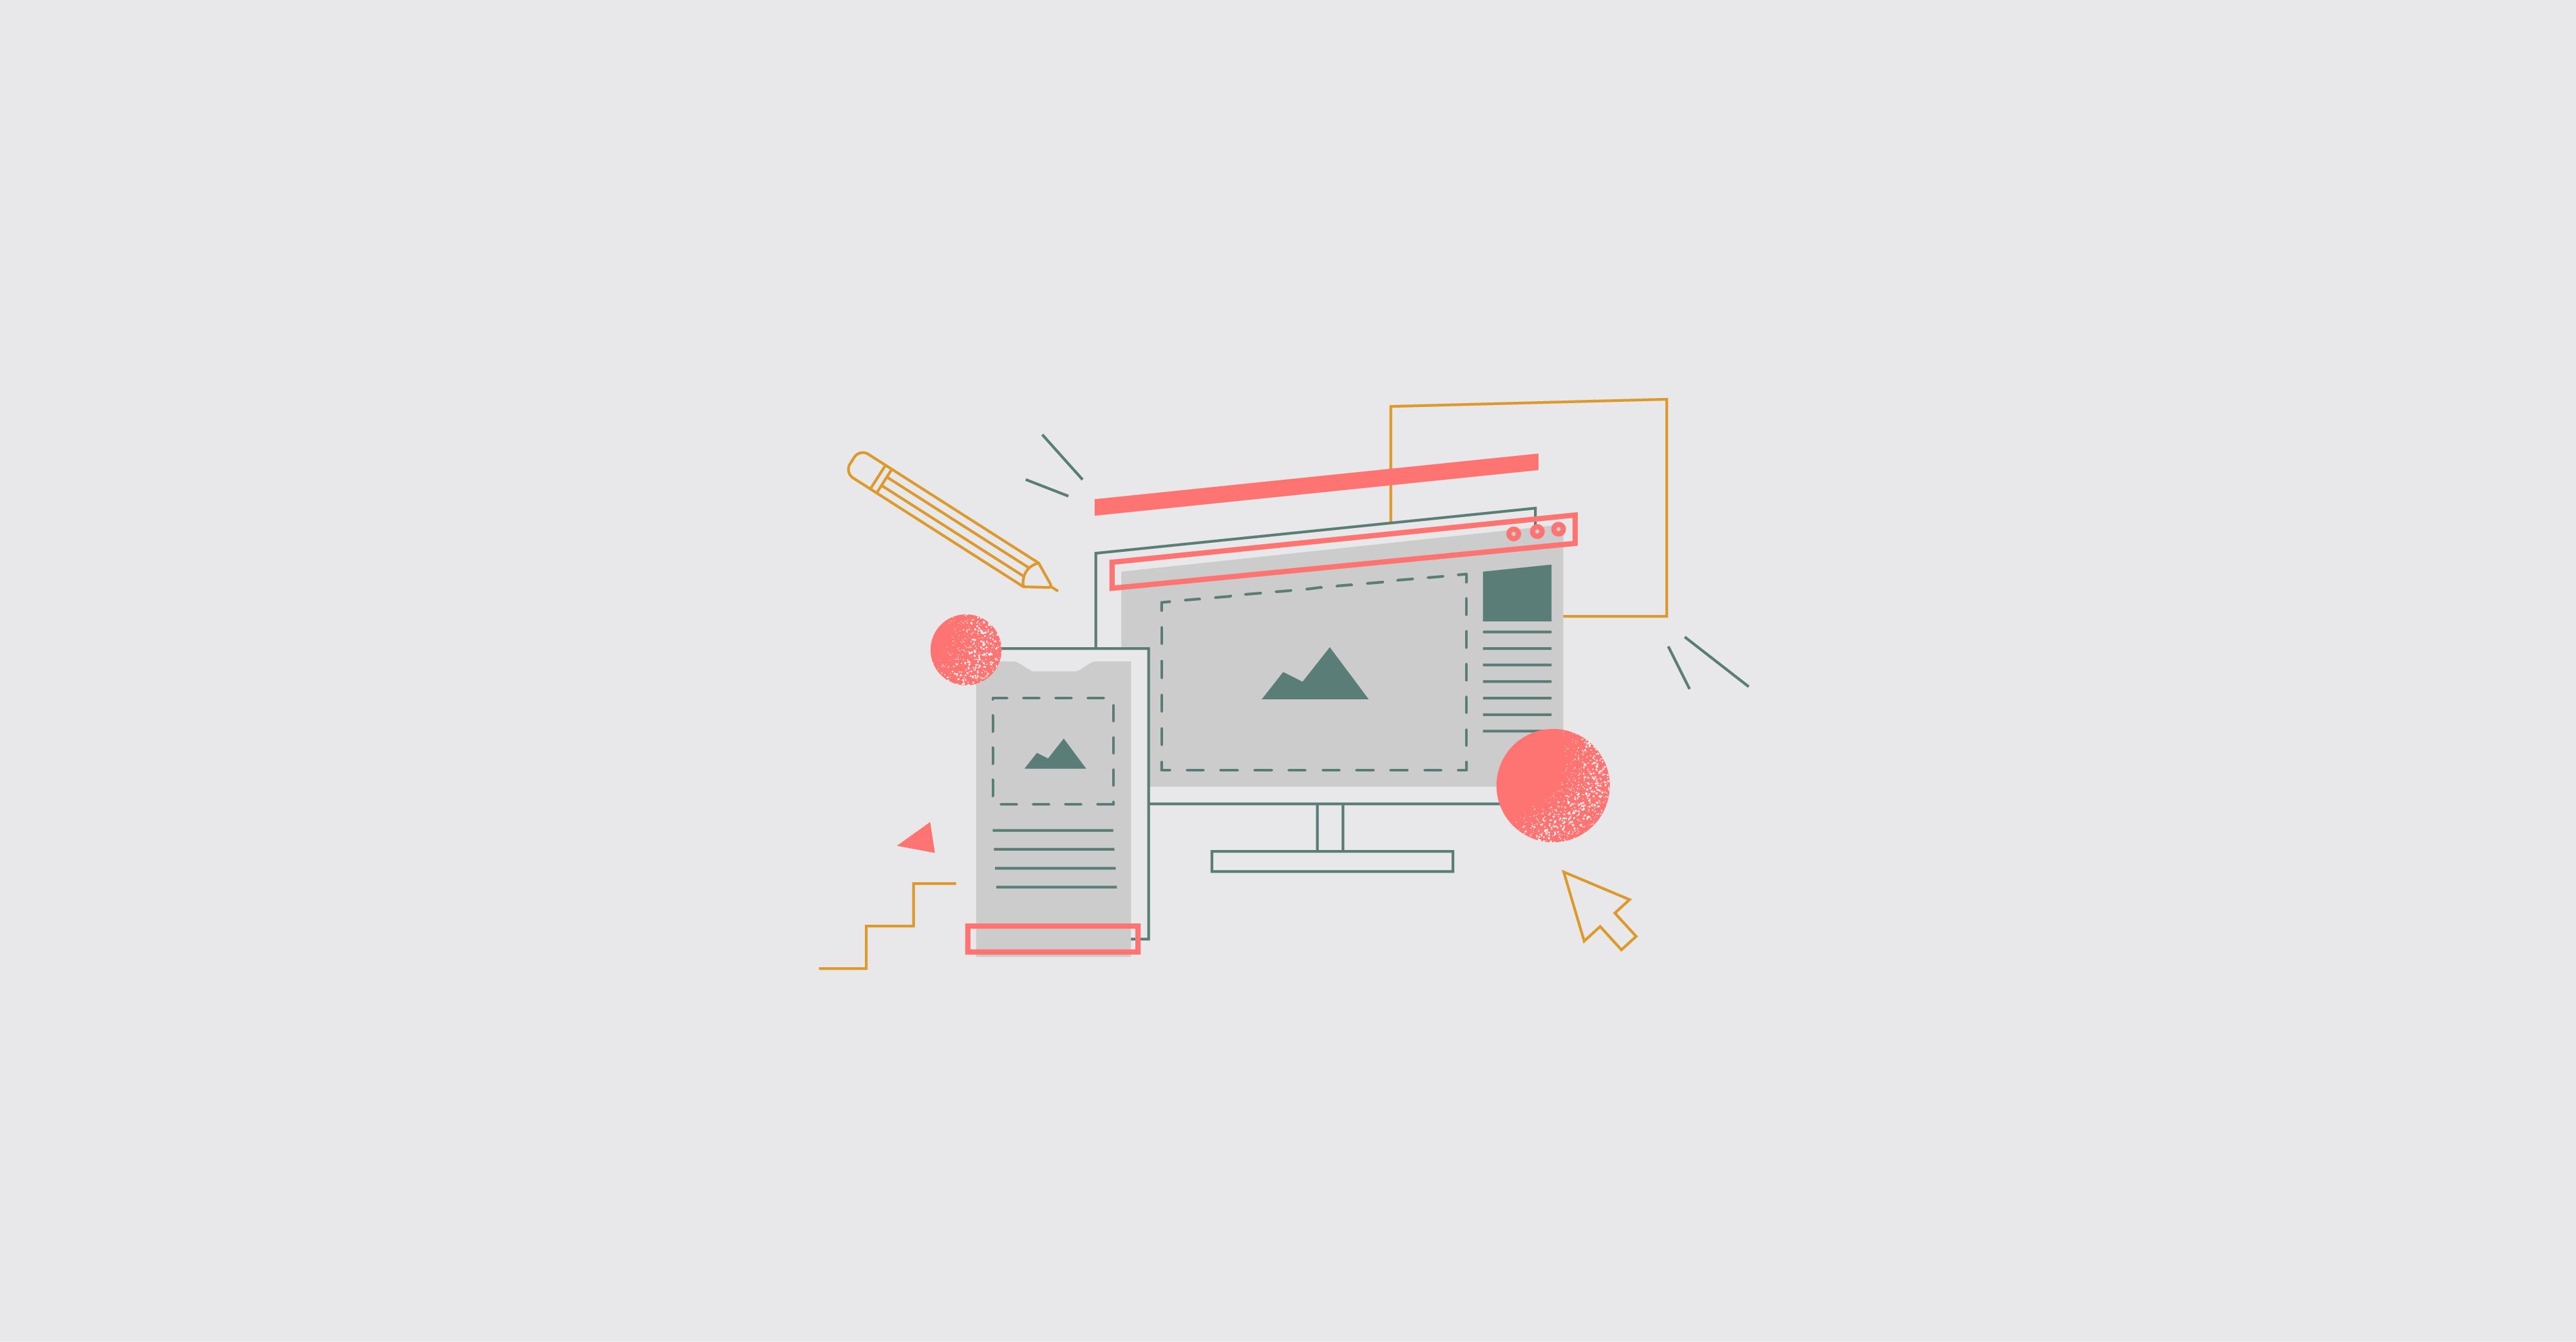 Brochure Website: Useless Idea or Easy Business Start?